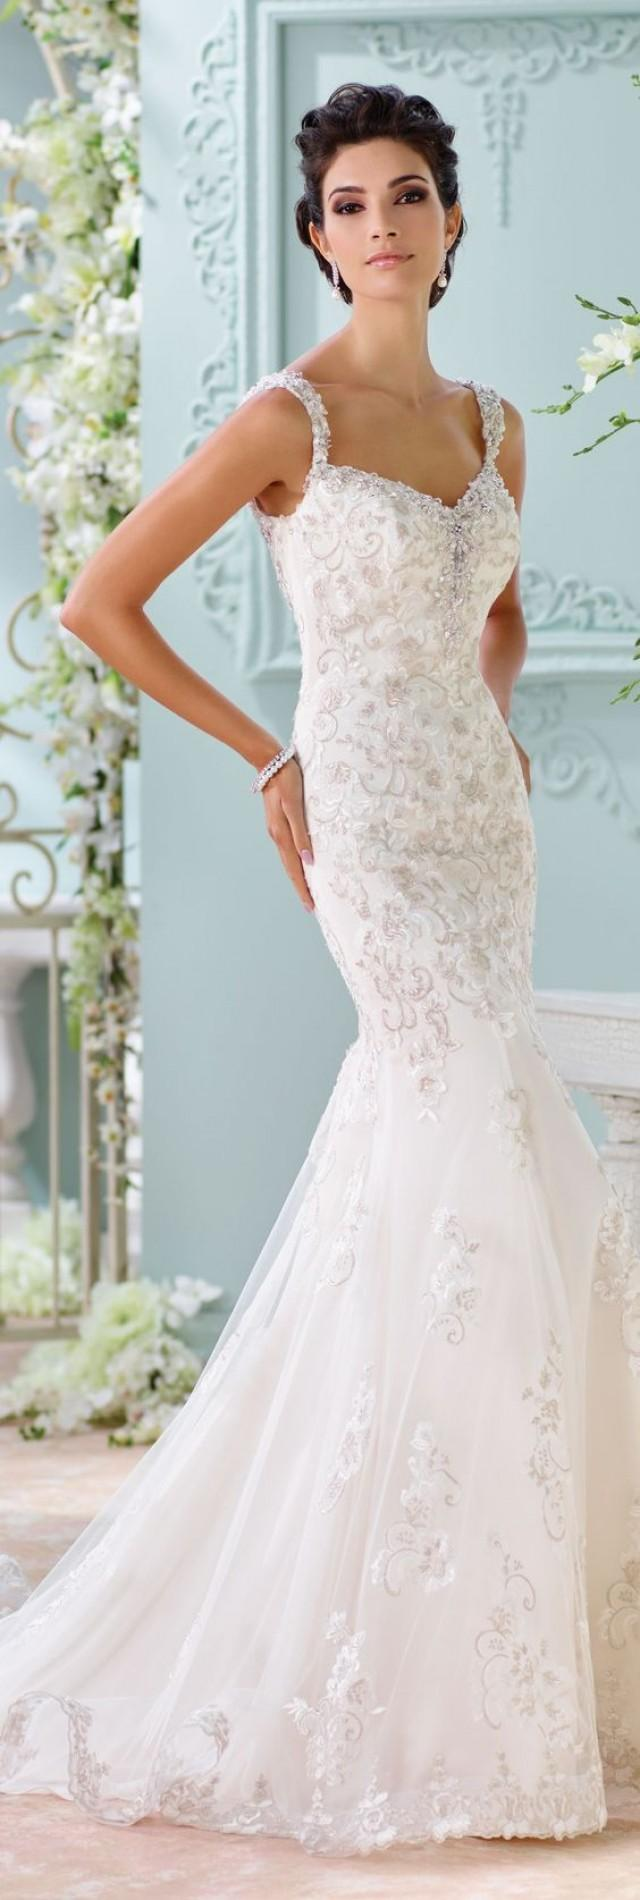 Famous Bcbg Wedding Gown Festooning - Wedding Plan Ideas ...